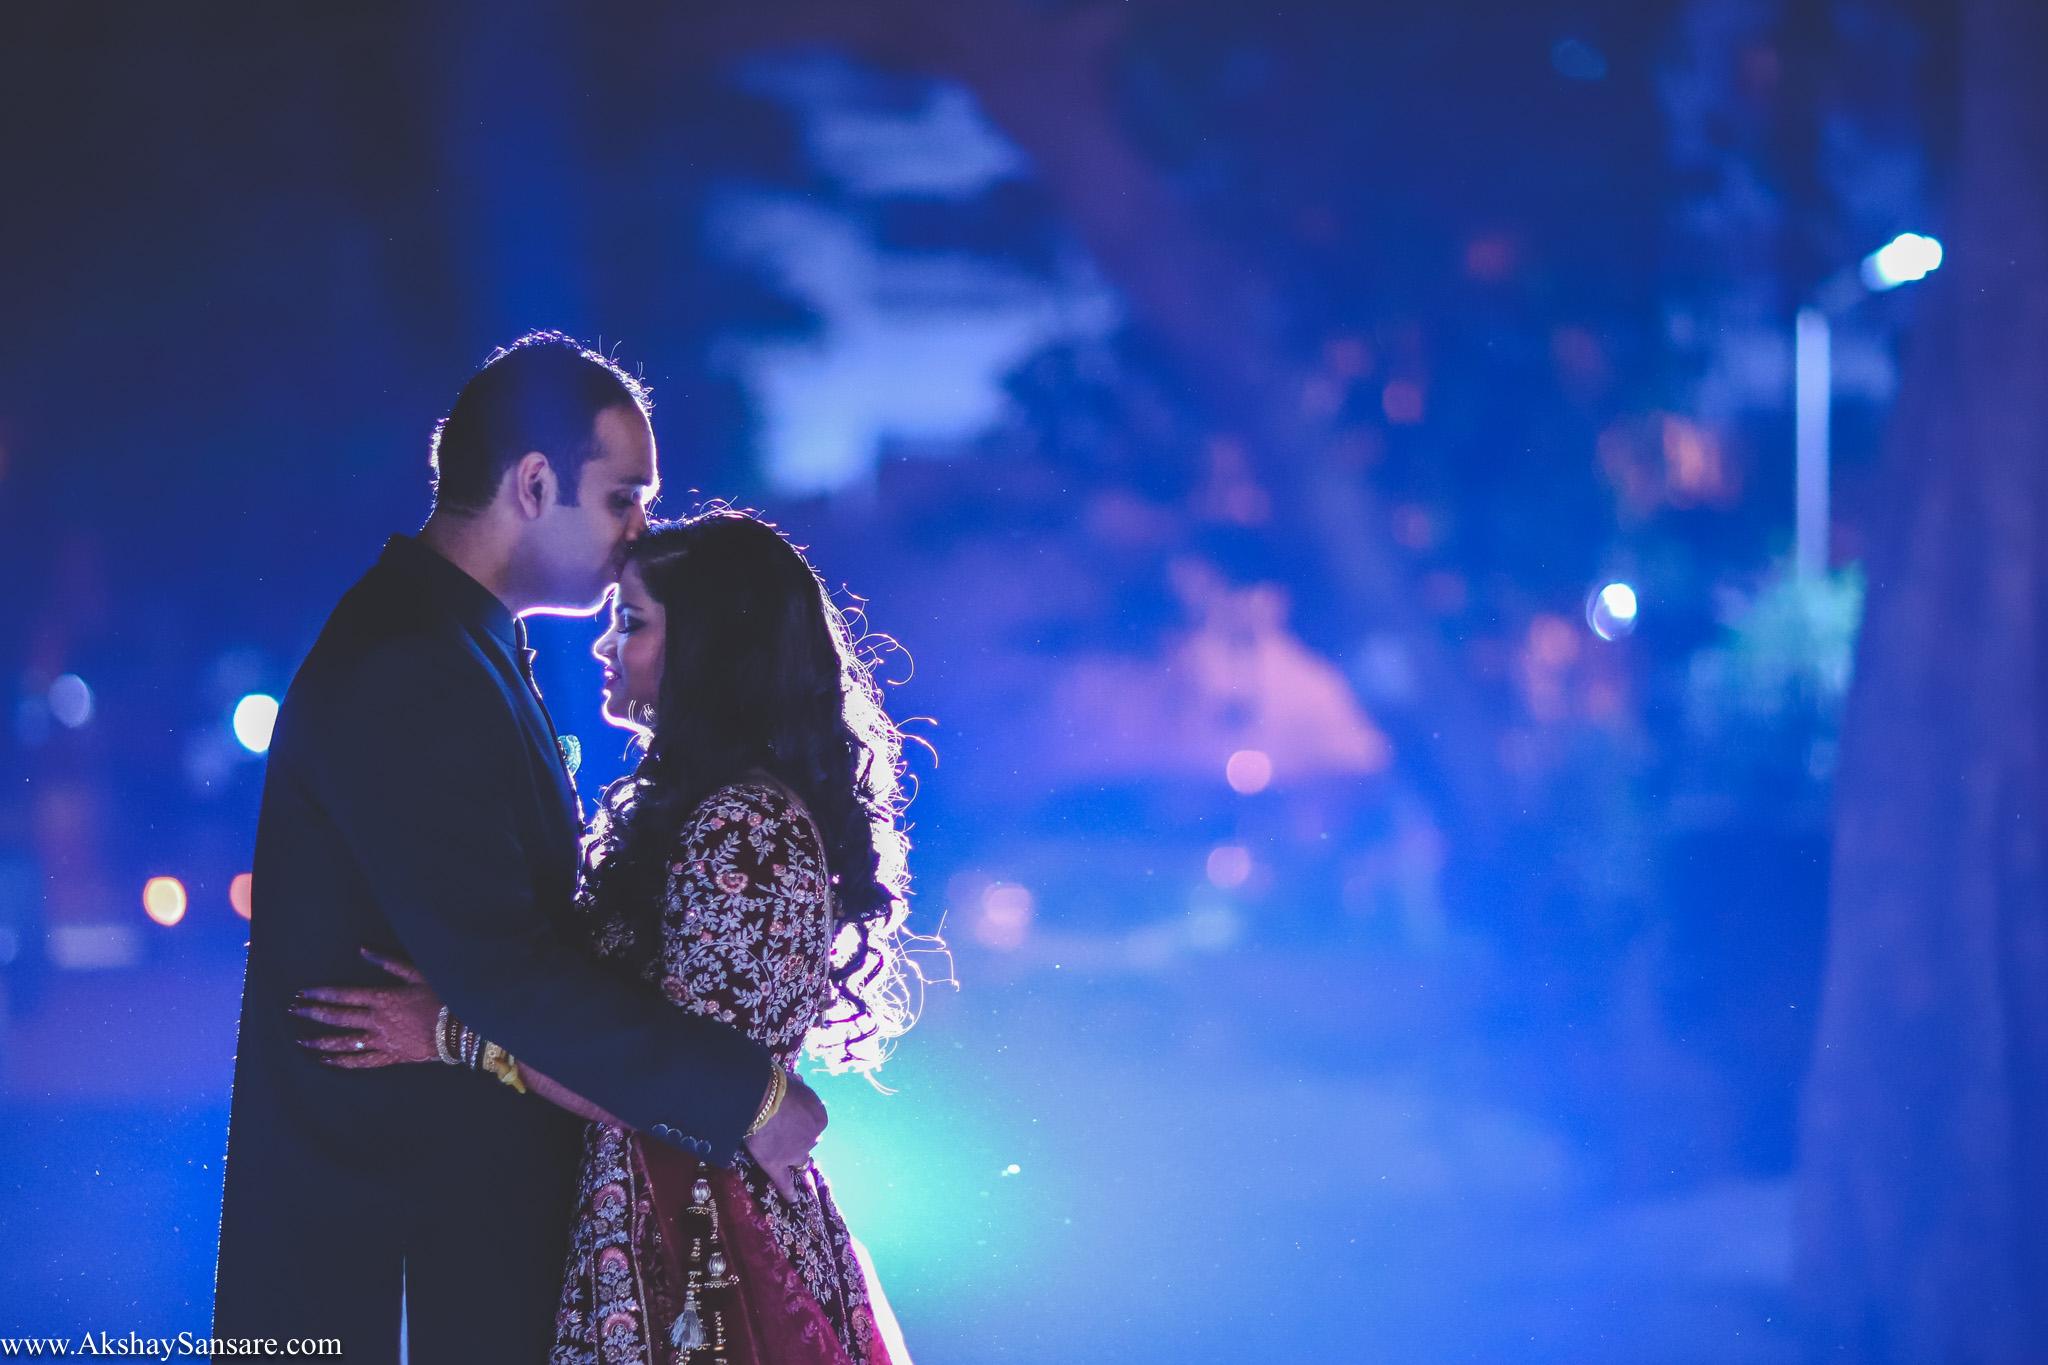 Salil x Kimaya Akshay Sansare Photography Candid wedding Photographer in mumbai best(40).jpg